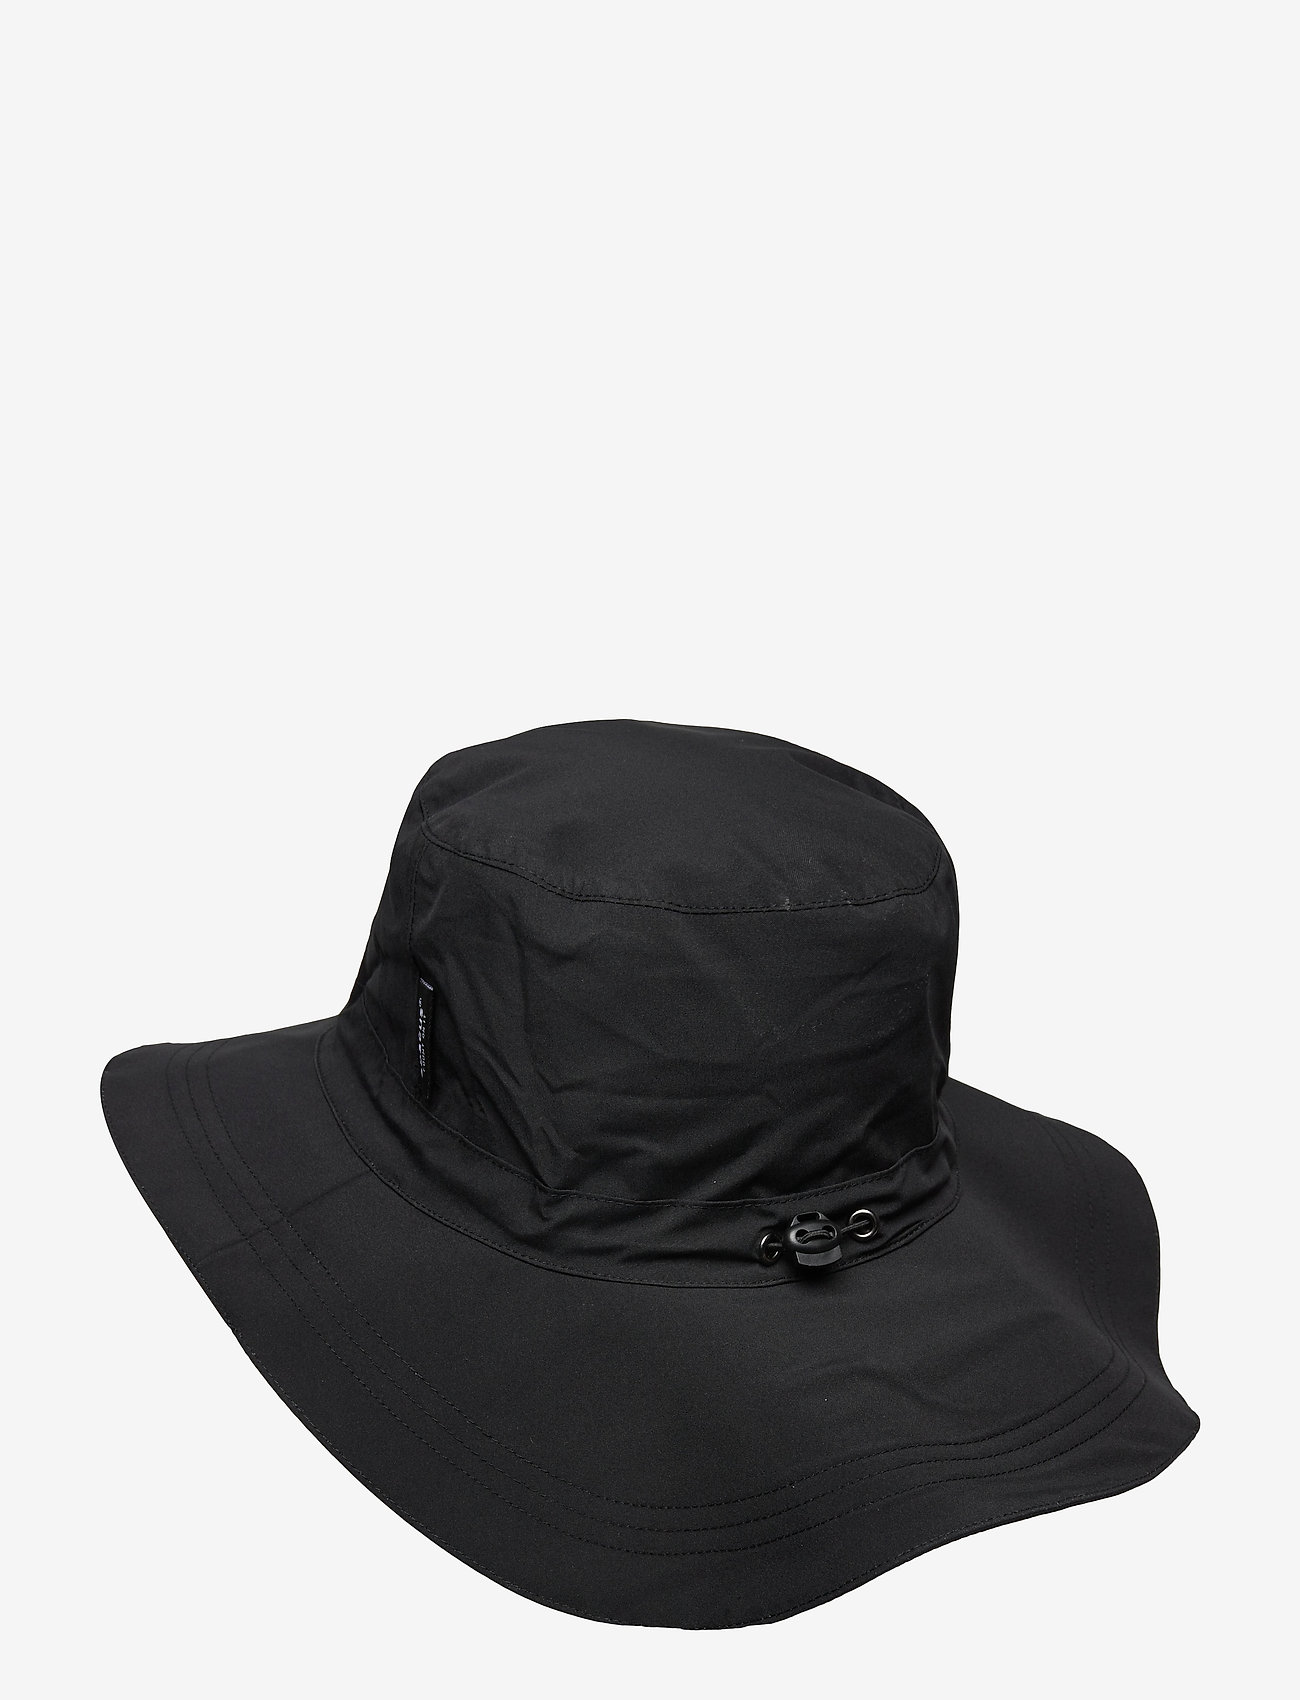 Abacus - Links rainhat - bucket hats - black - 1